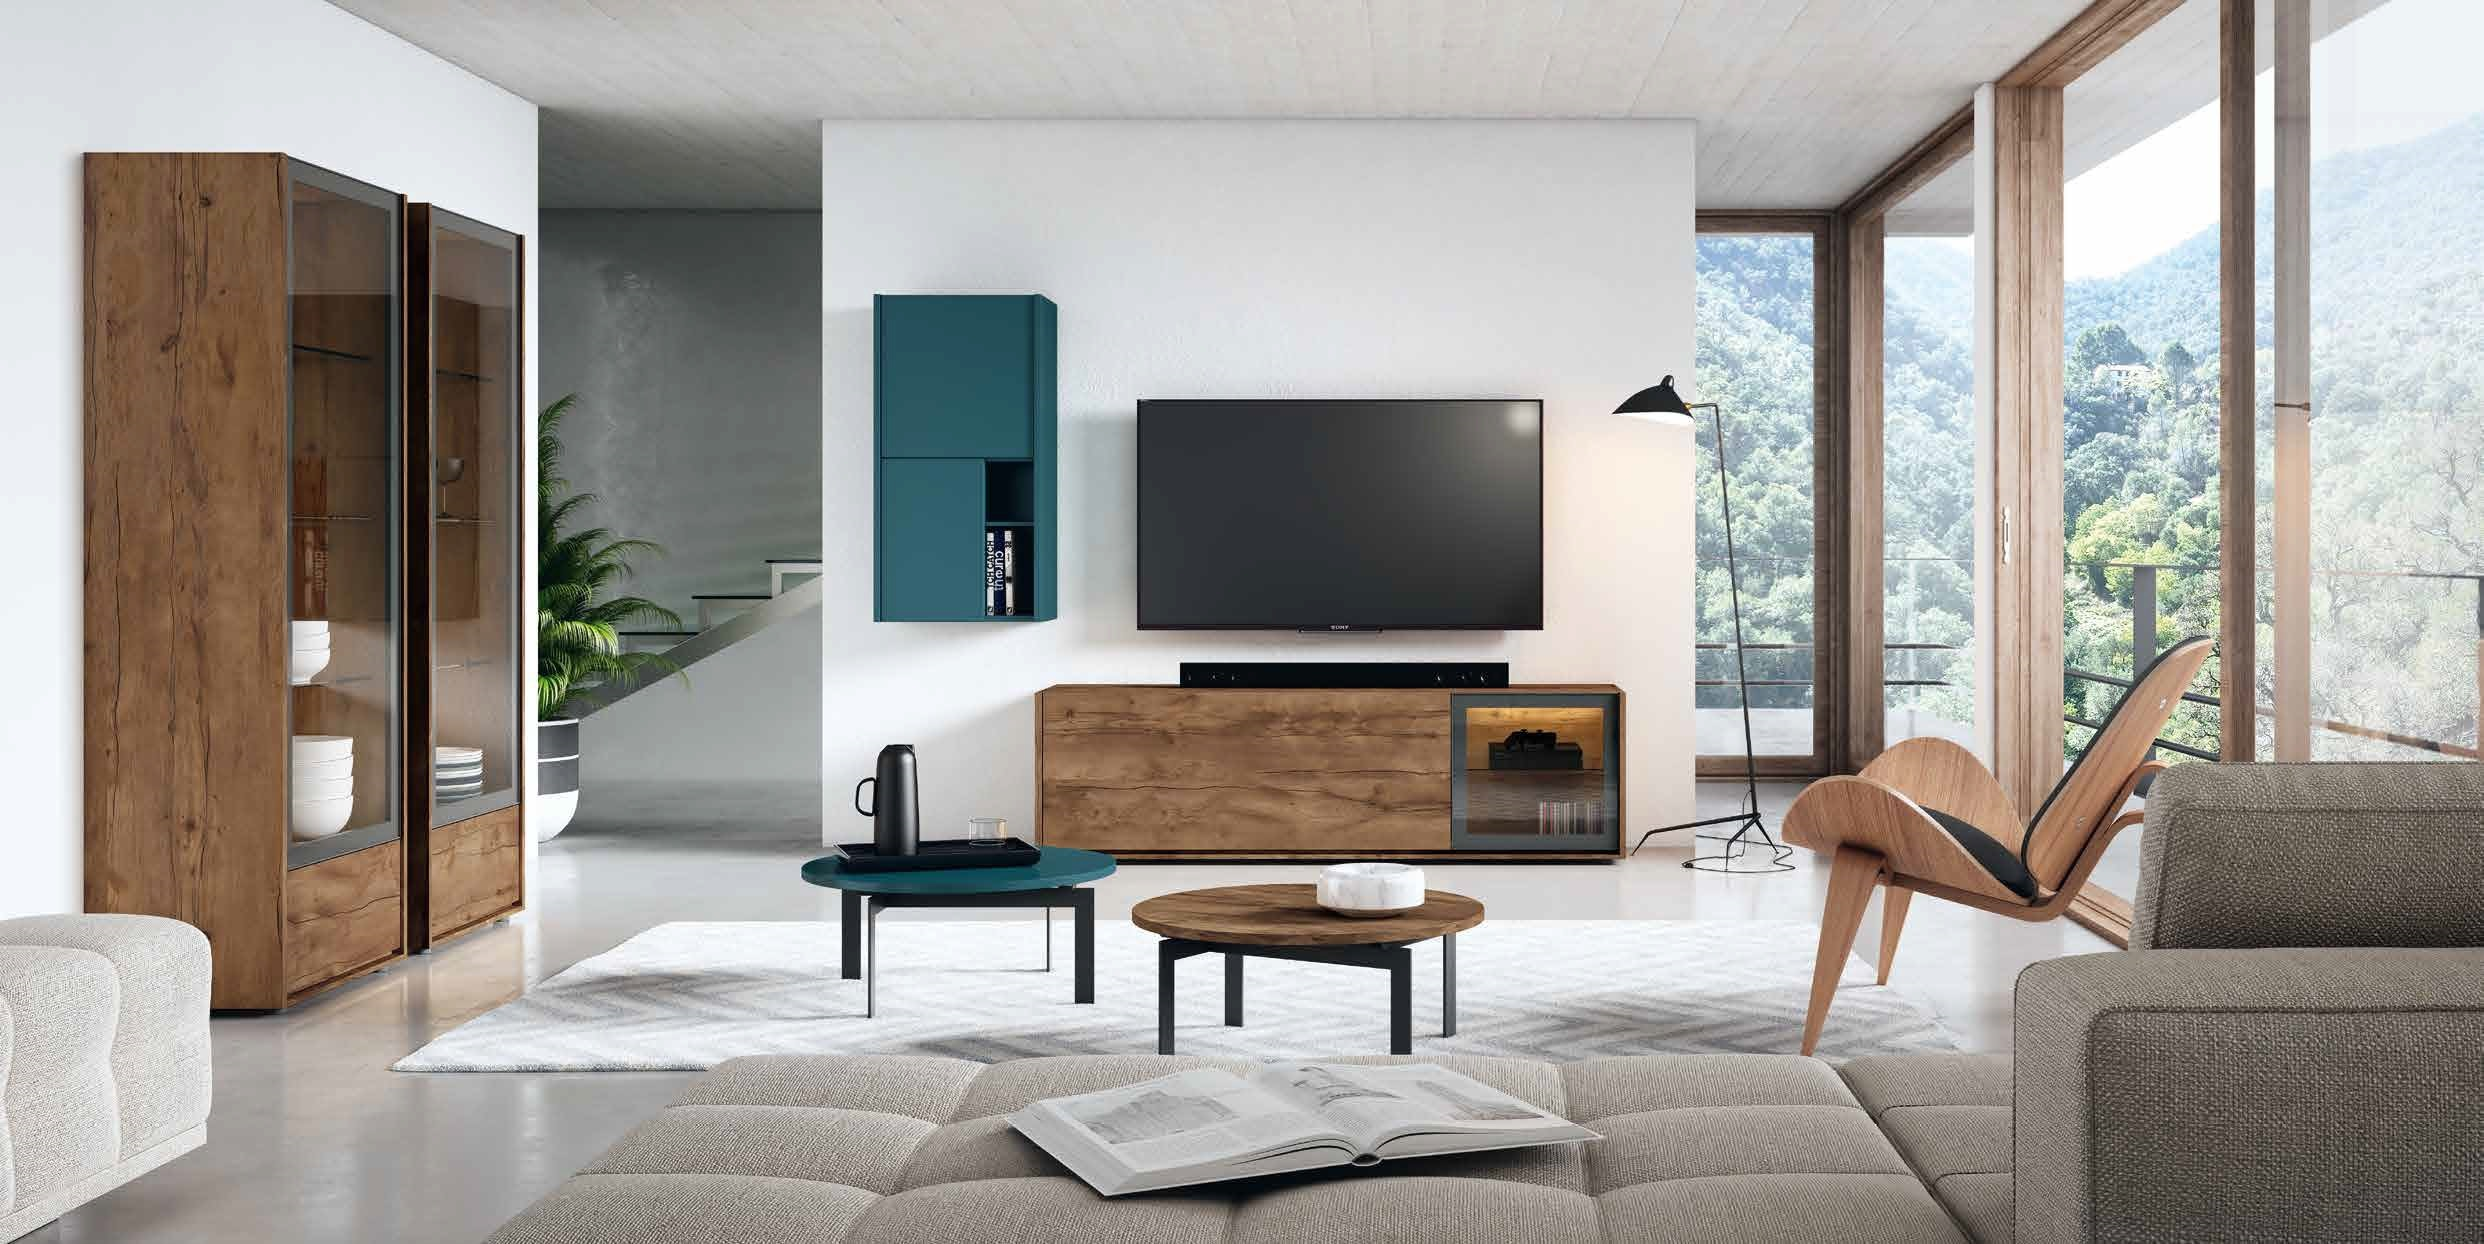 salon-moderno-Nativ-2019-muebles-paco-caballero-0920-5c8ceaa1f237f